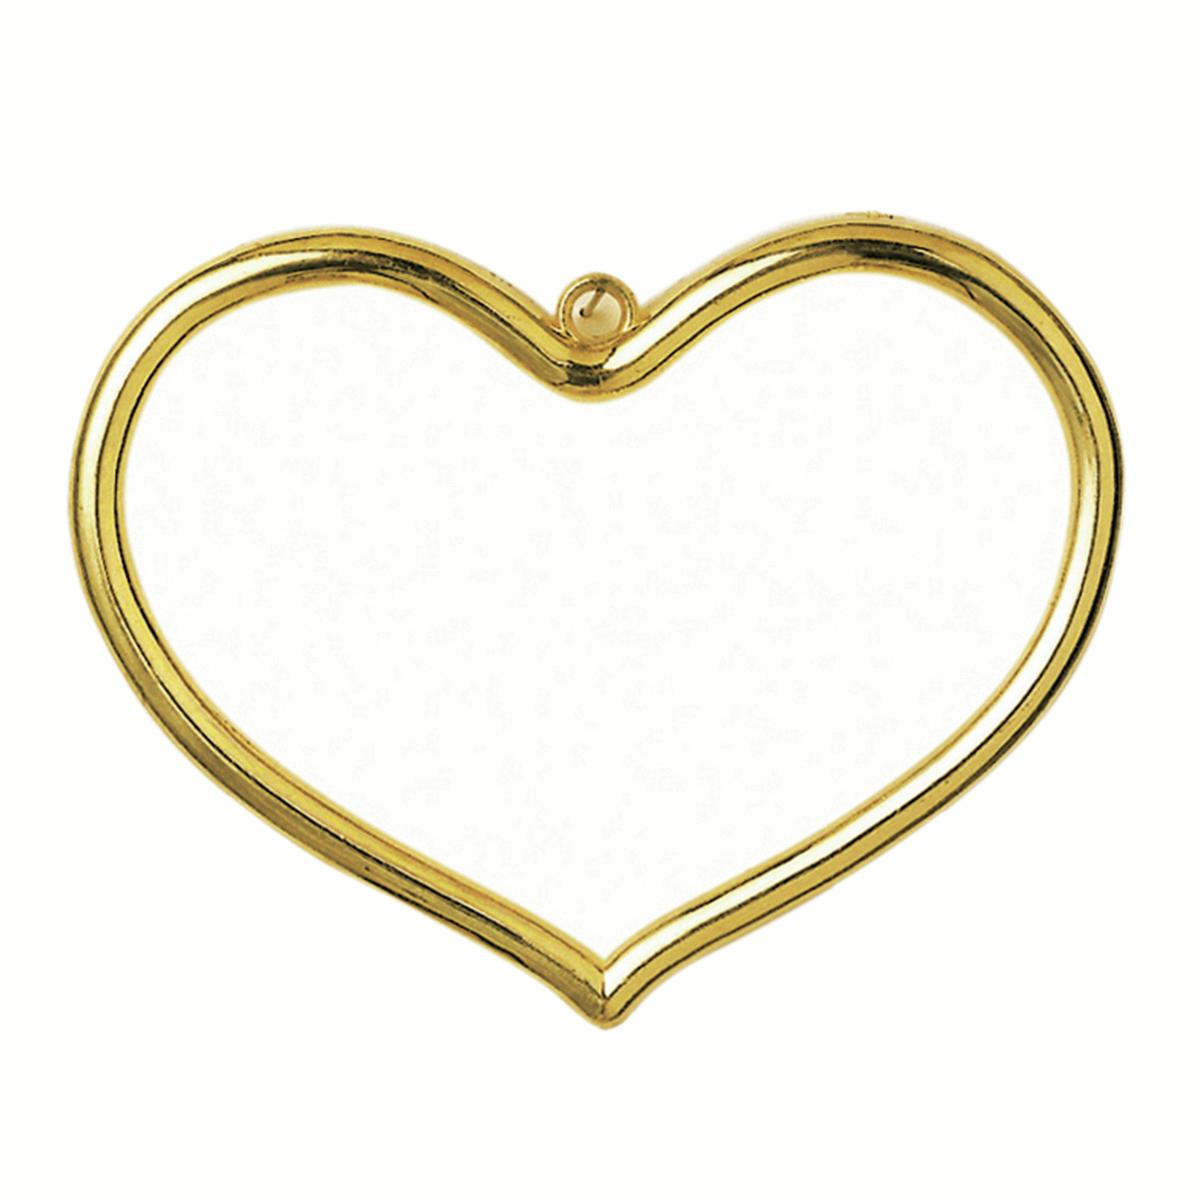 Plastic Heart Shaped Frame - Gold